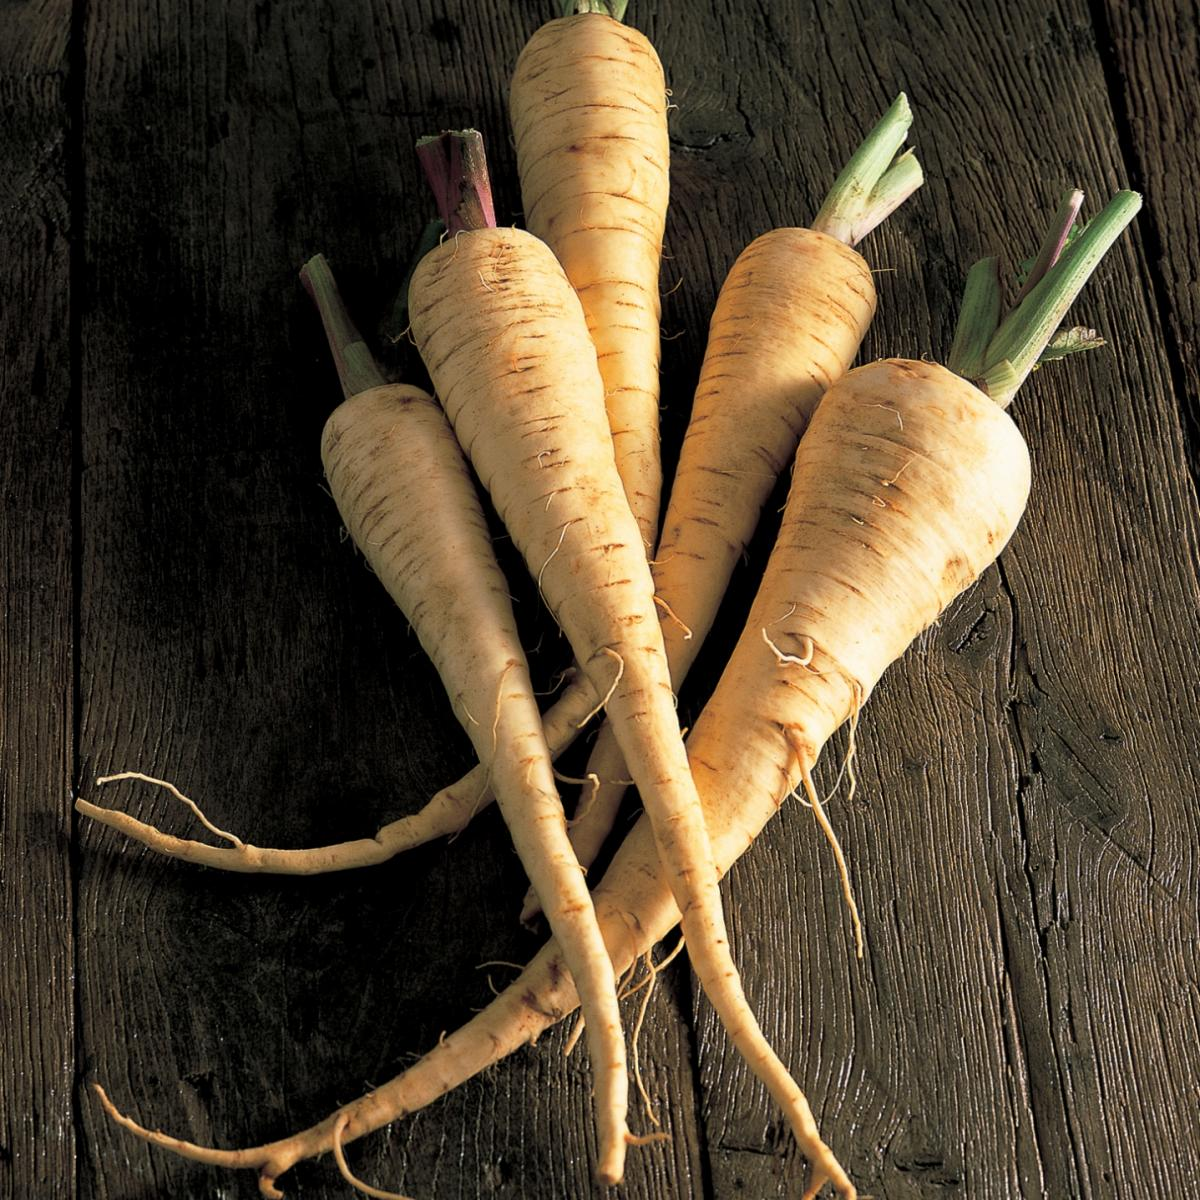 Ingredient soup parsnips